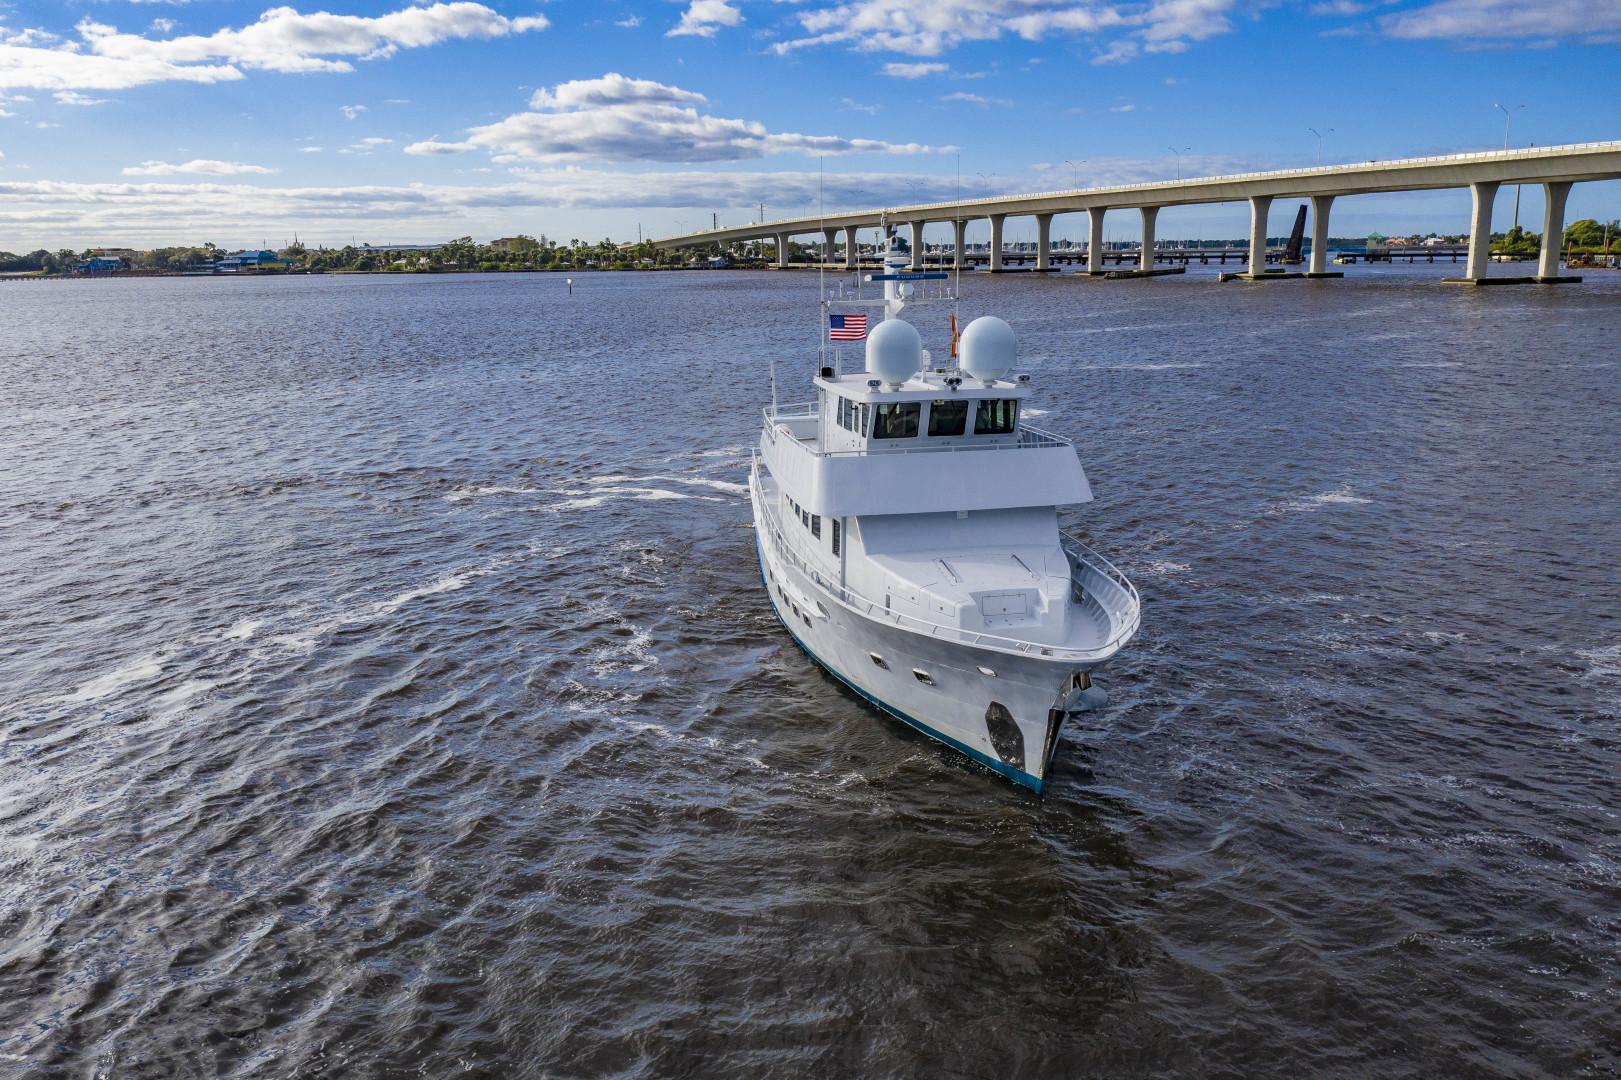 GlassTech-Expedition Yacht 2018-Reset Stuart-Florida-United States-Profile-1568545 | Thumbnail